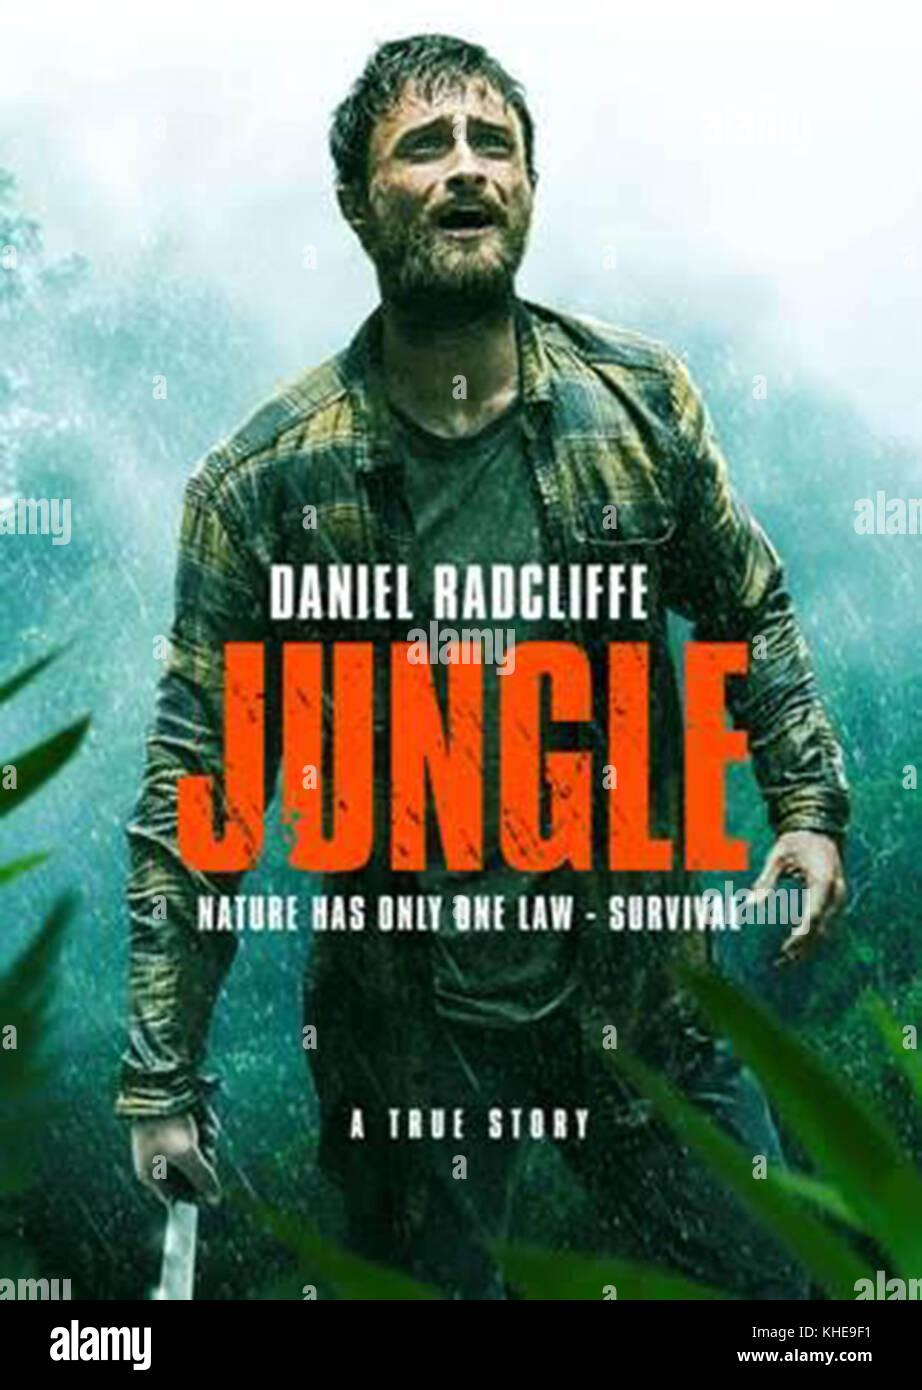 JUNGLE (2017)  DANIEL RADCLIFFE  GREG MCLEAN (DIR)  SCREEN AUSTRALIA/MOVIESTORE COLLECTION LTD - Stock Image